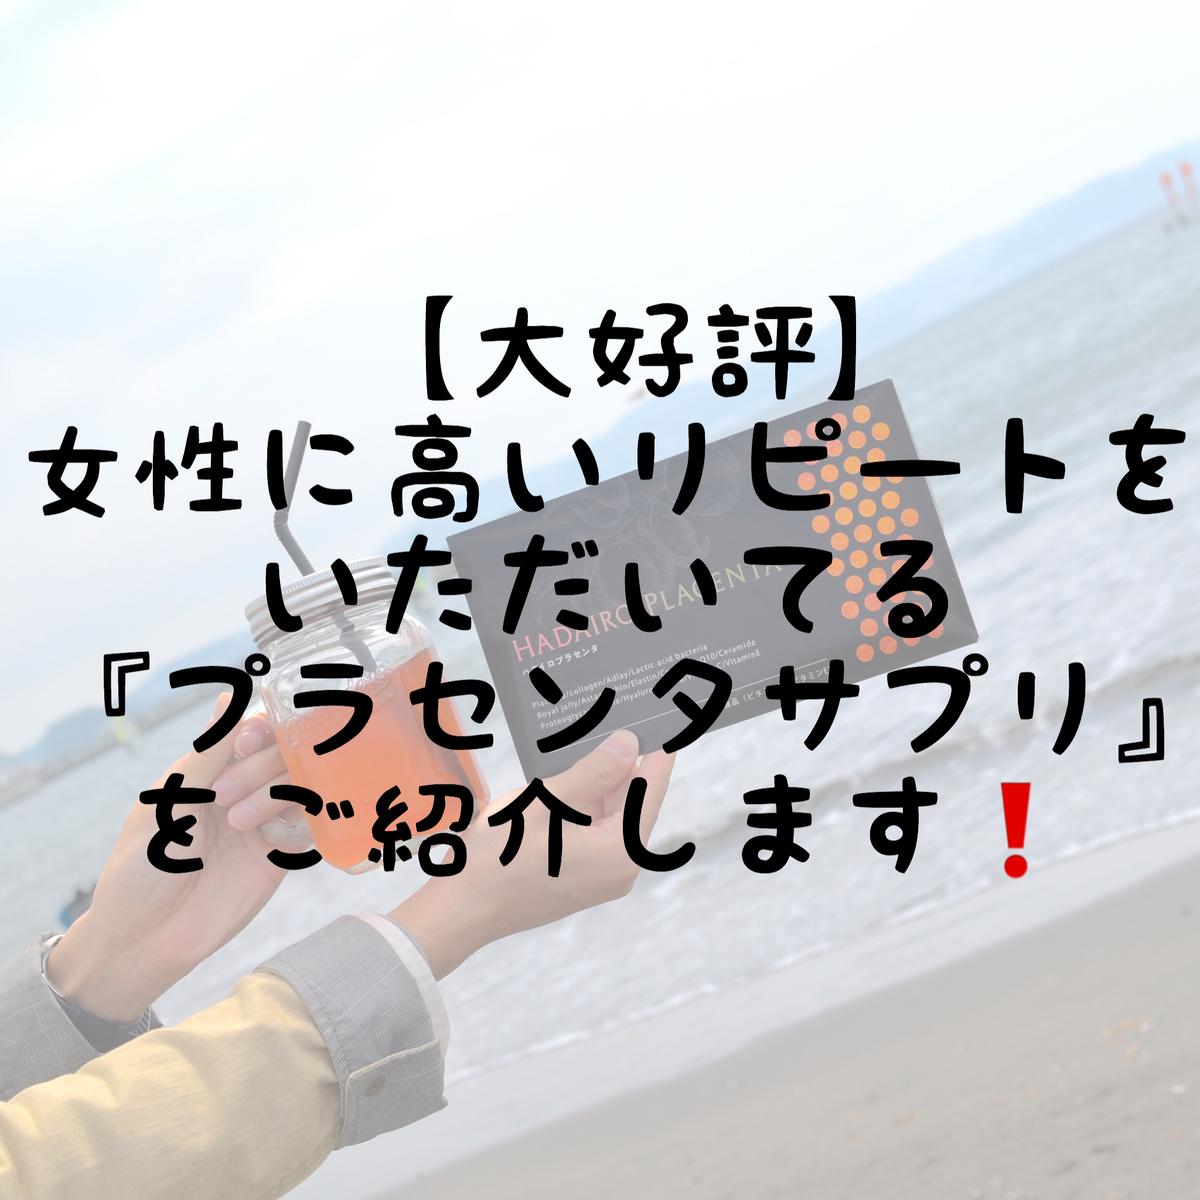 f:id:nokonoko_o:20200523151003j:plain